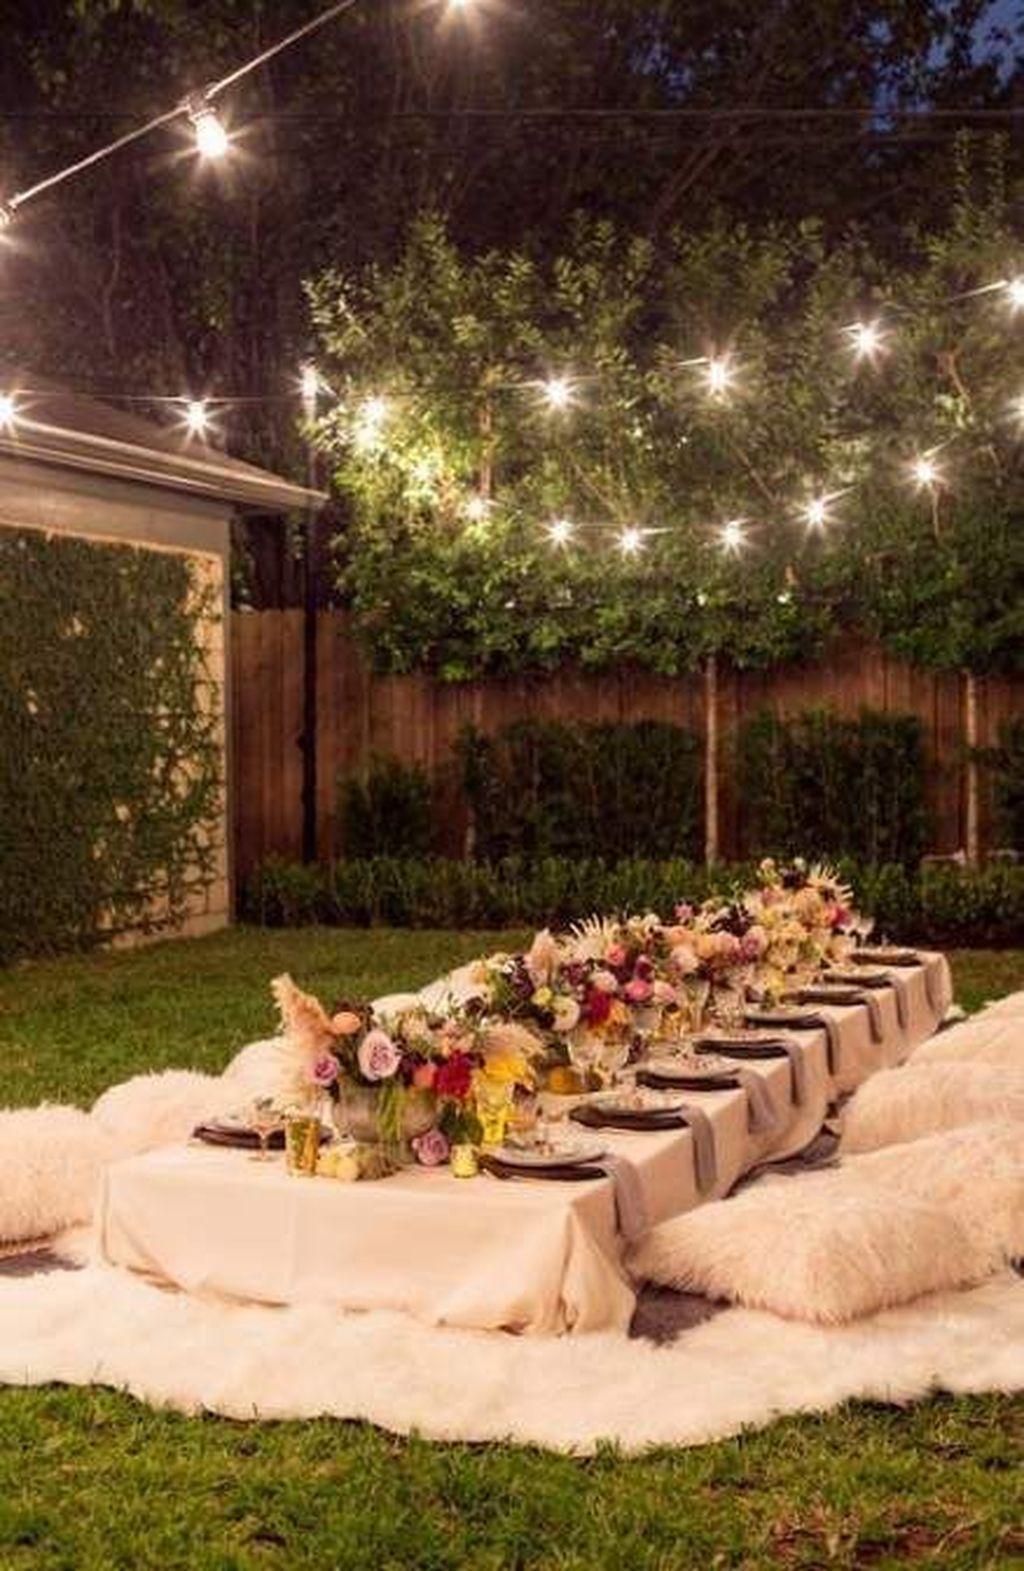 Fabulous Fall Backyard Party Decorations Ideas 25